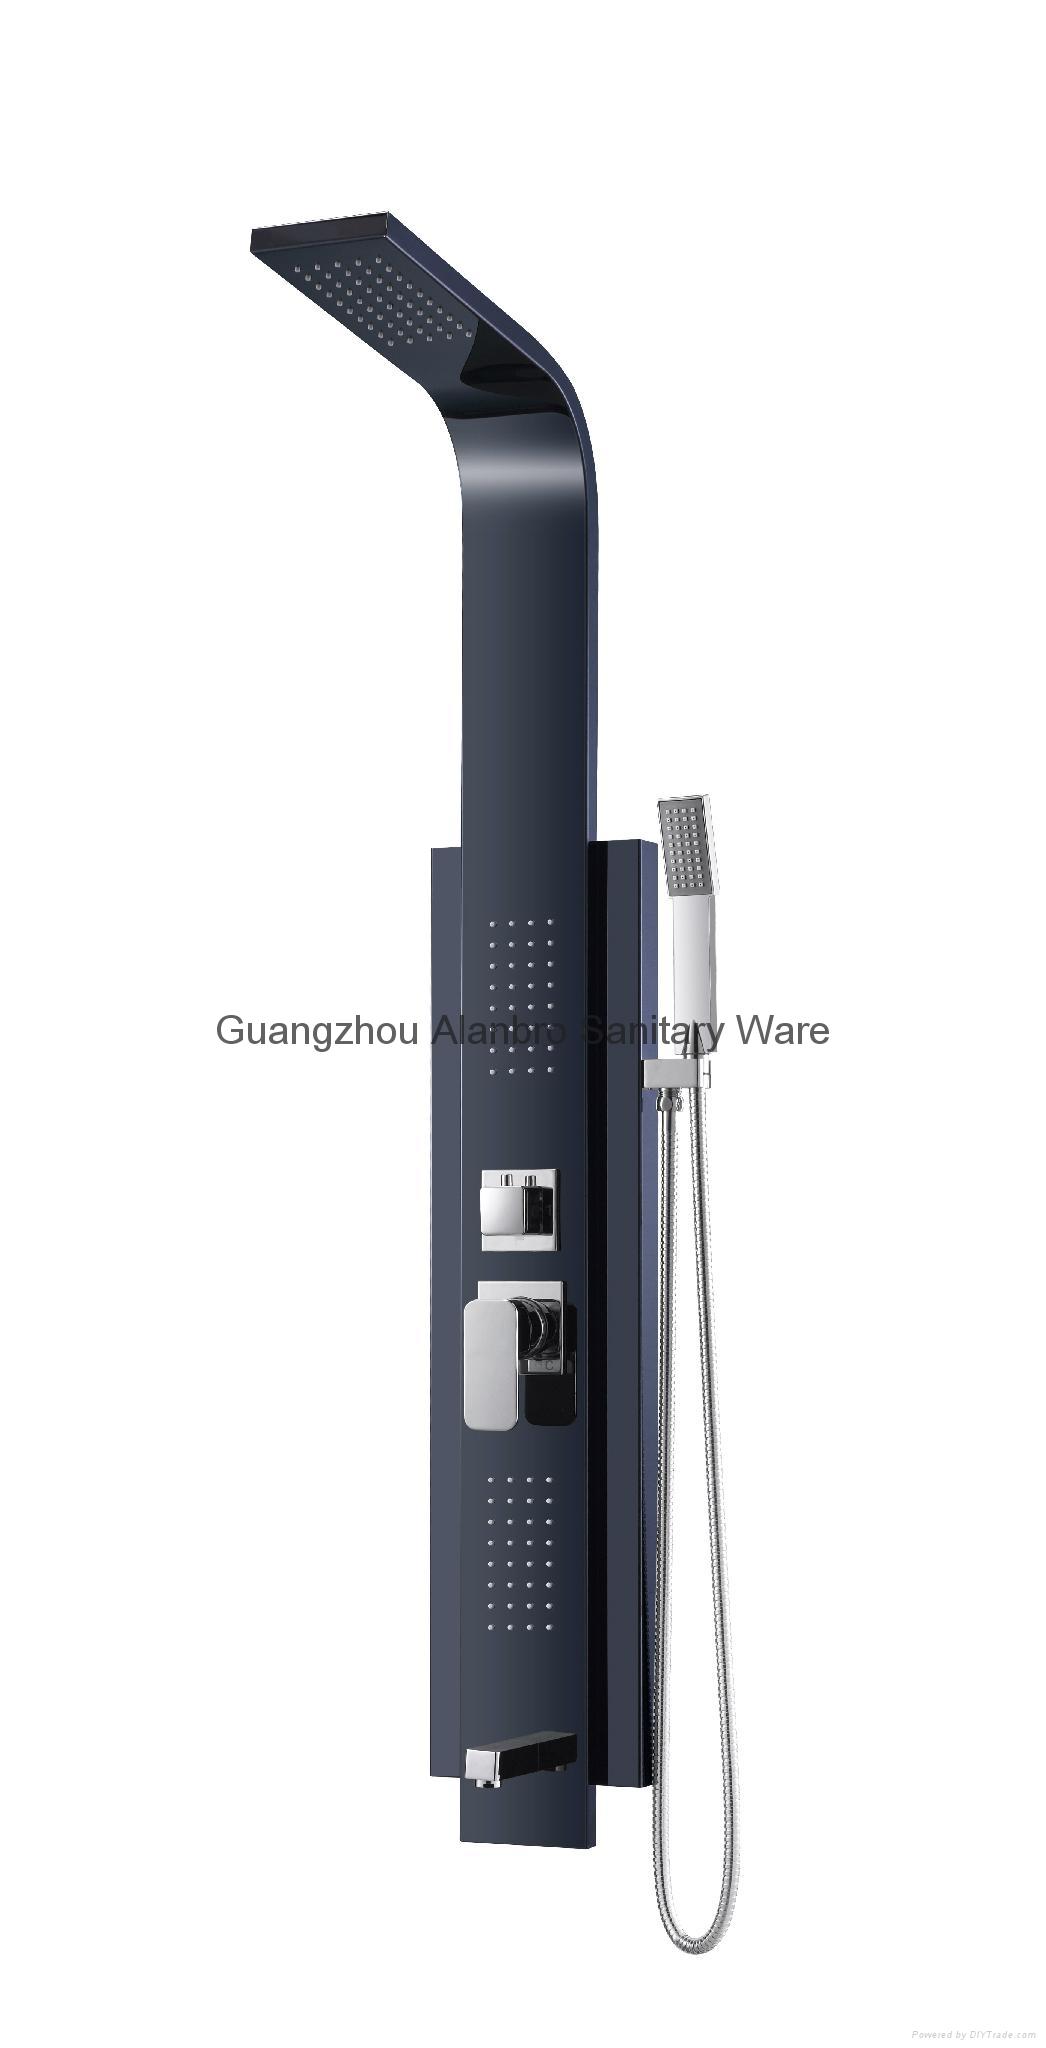 shower panel shower head  shower set G2018A-D-WS for steam shower room 5